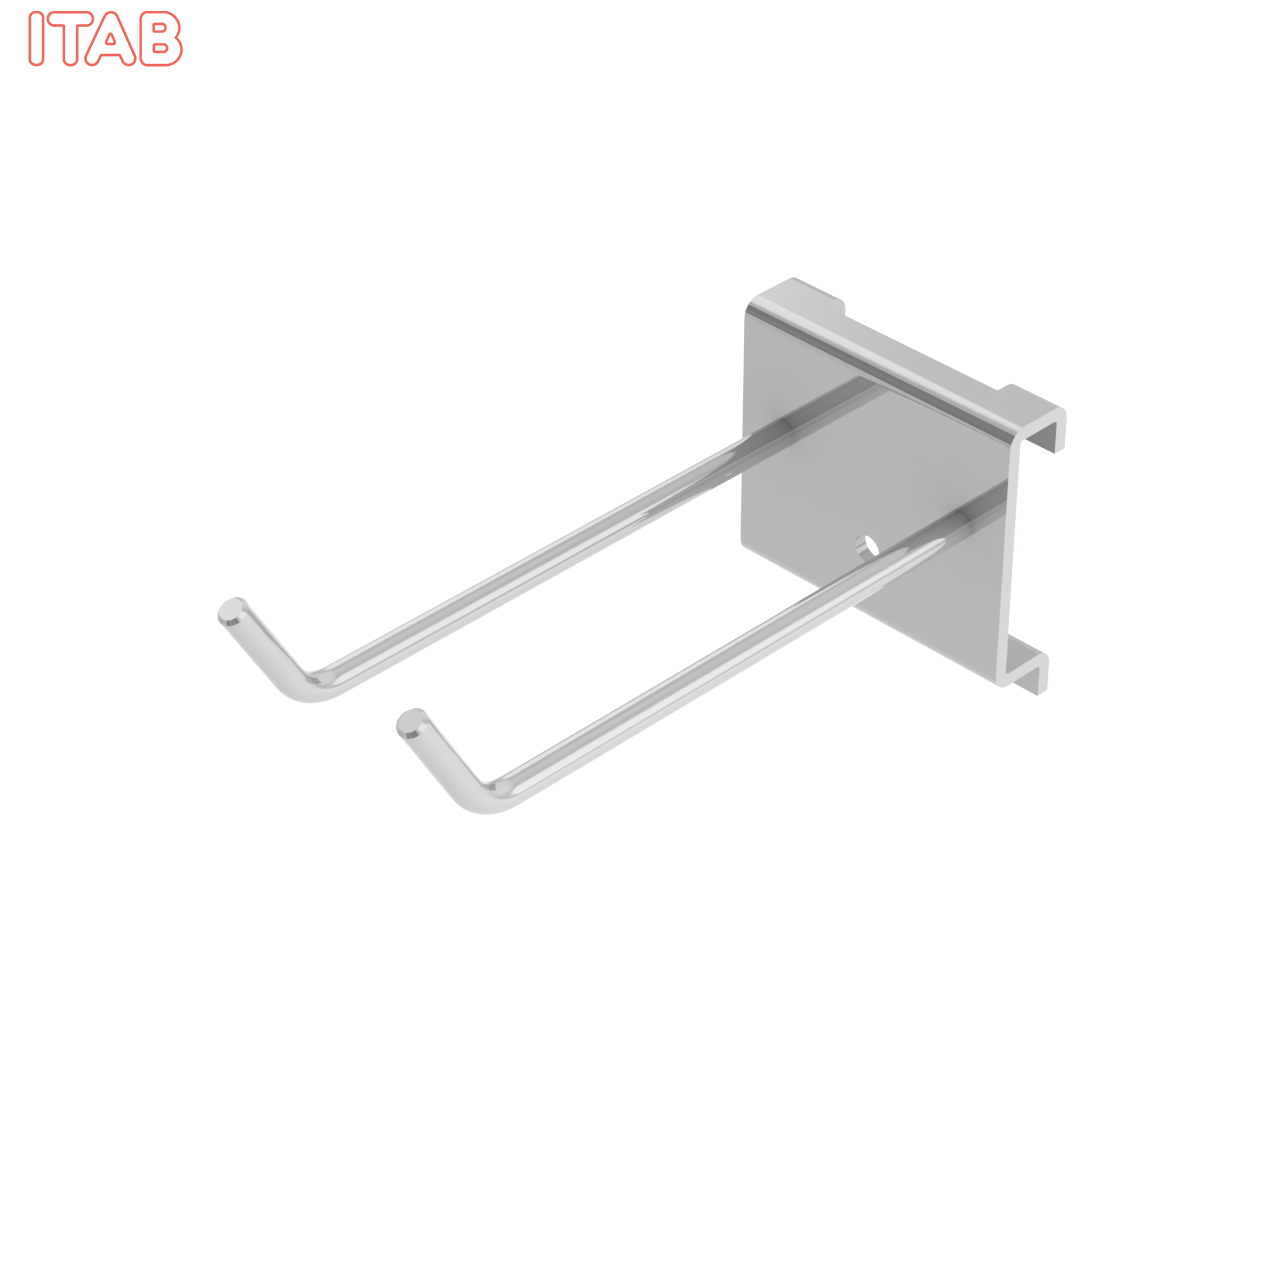 R-Kannatin R-2+Ruuvi D10, ø4mm